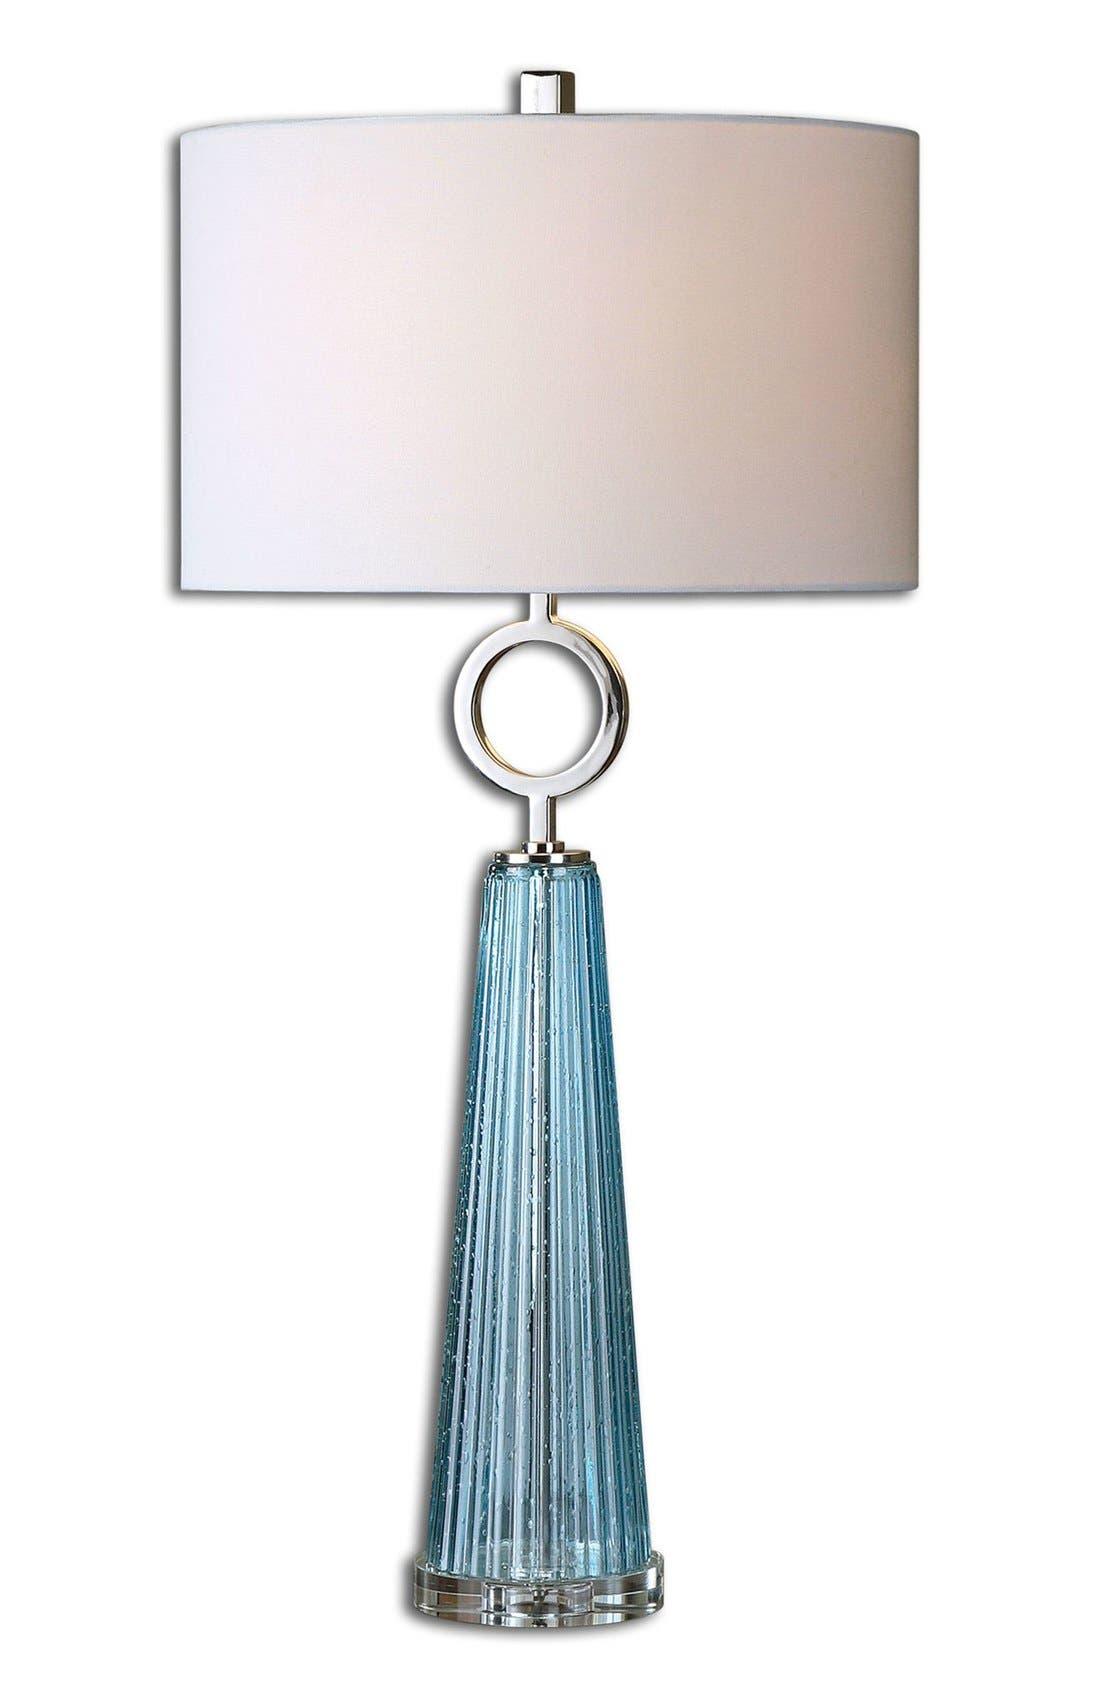 Main Image - Uttermost 'Navier' Seed Glass & Metallic Table Lamp